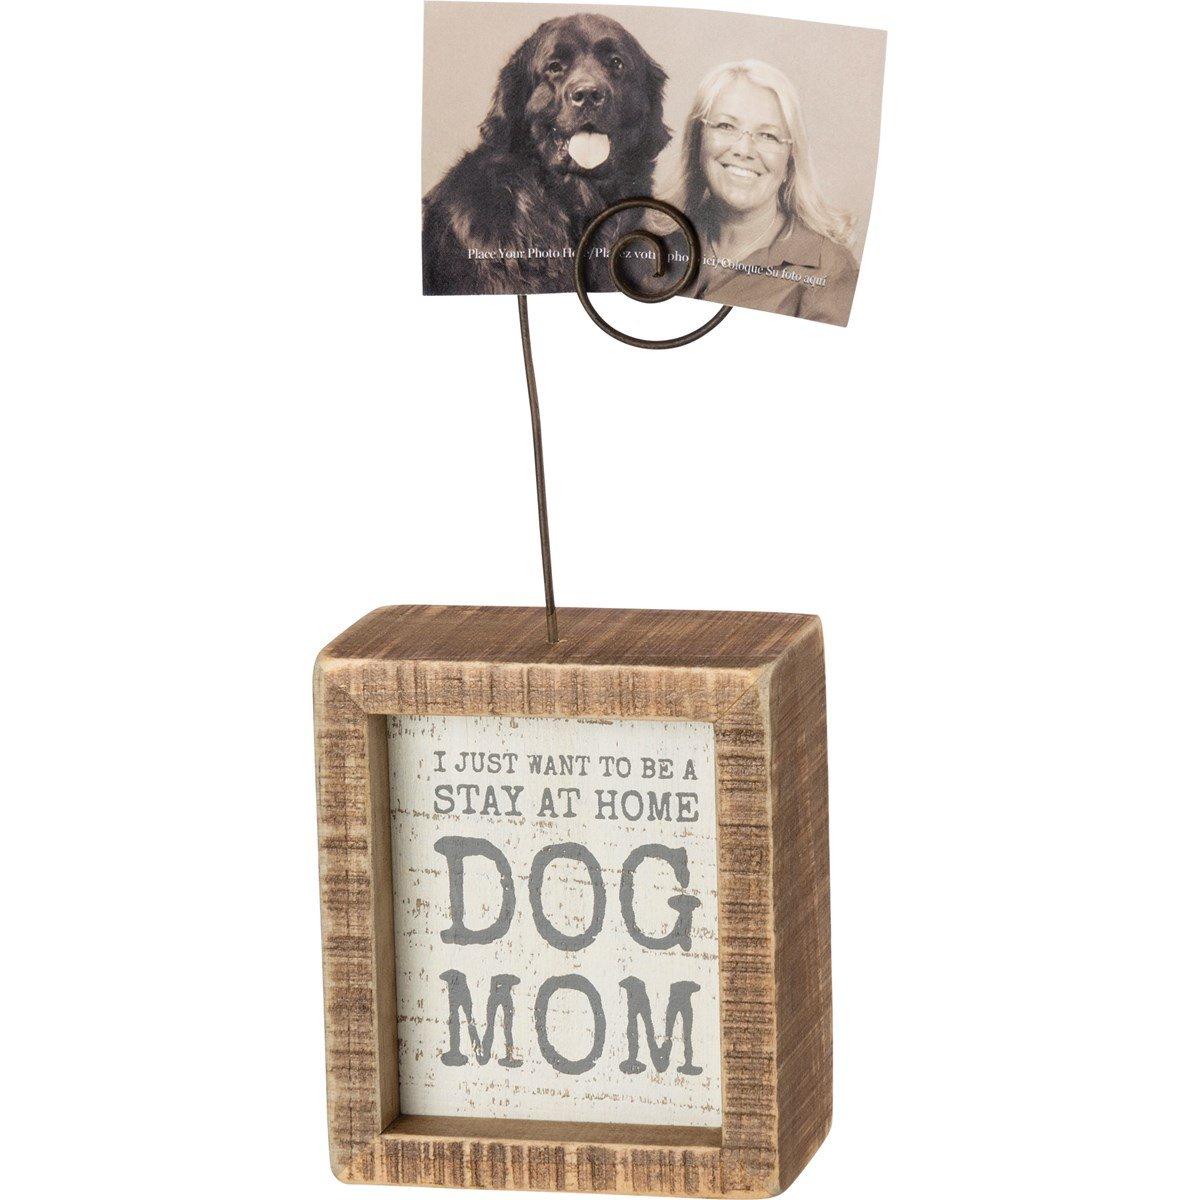 Dog Mom Insert Photo Block